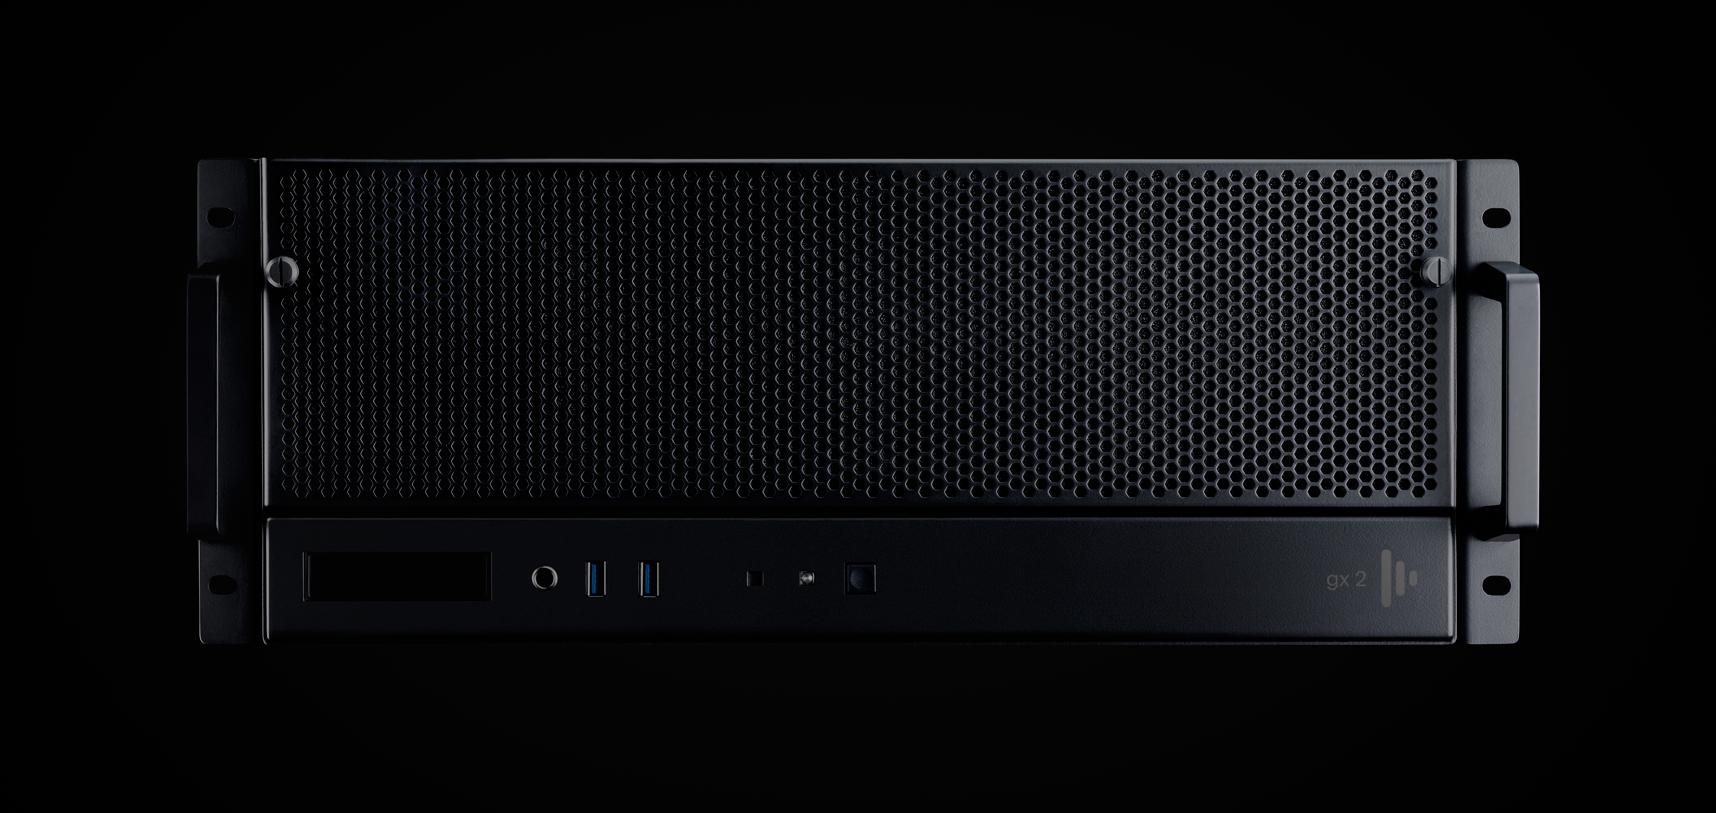 Disguise GX Range Media Servers - Notch Enabled